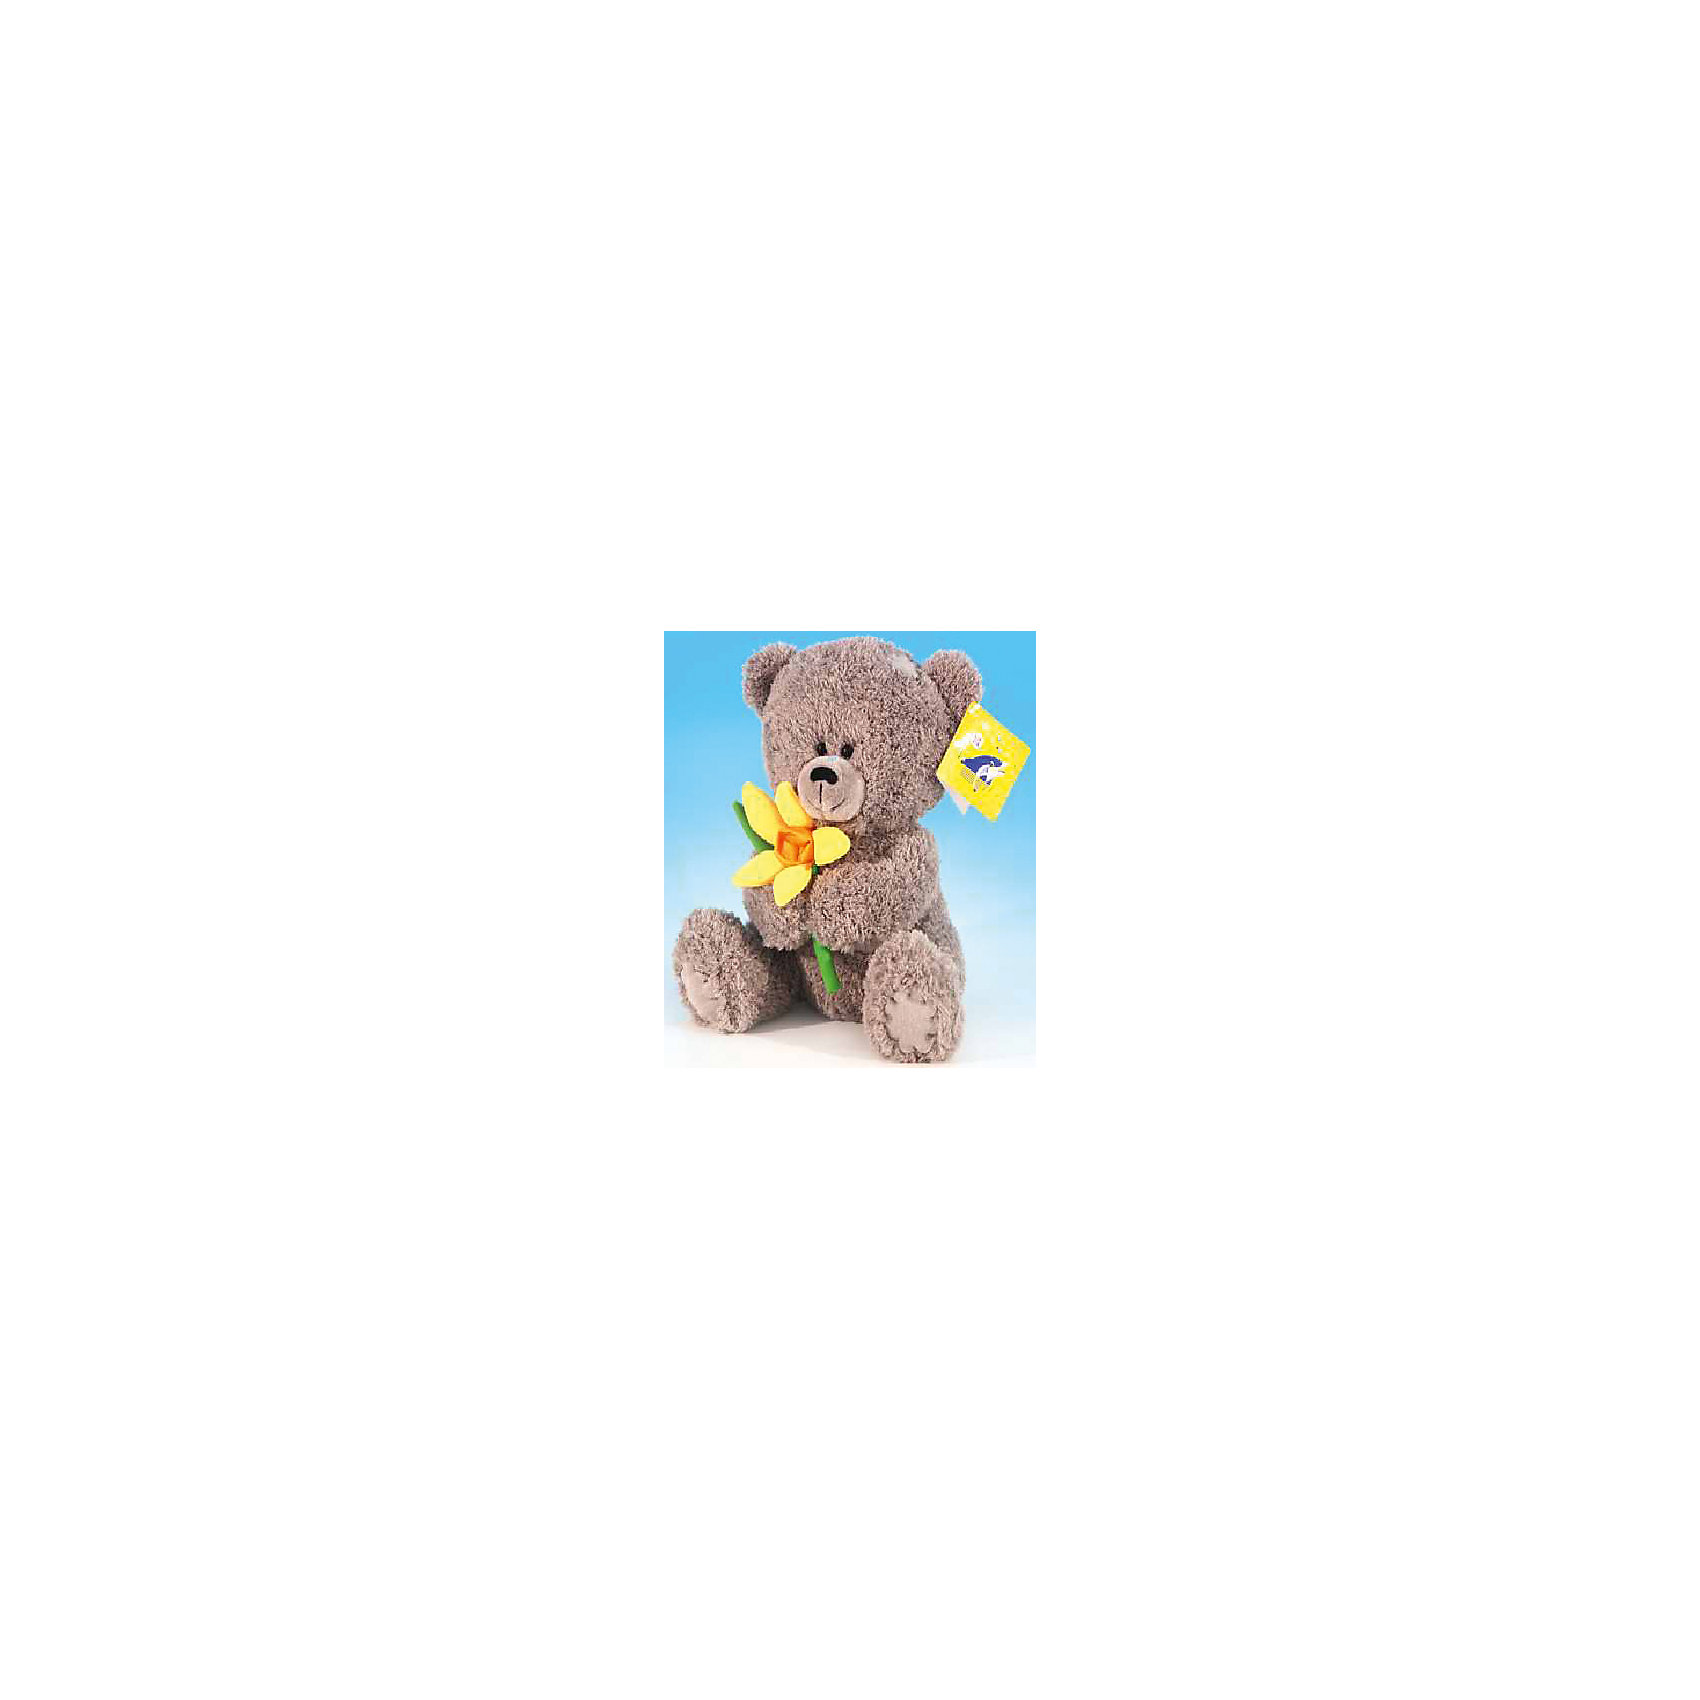 LAVA Медвежонок с нарциссом, музыкальный, 20см., LAVA lava жирафик музыкальный 31см lava